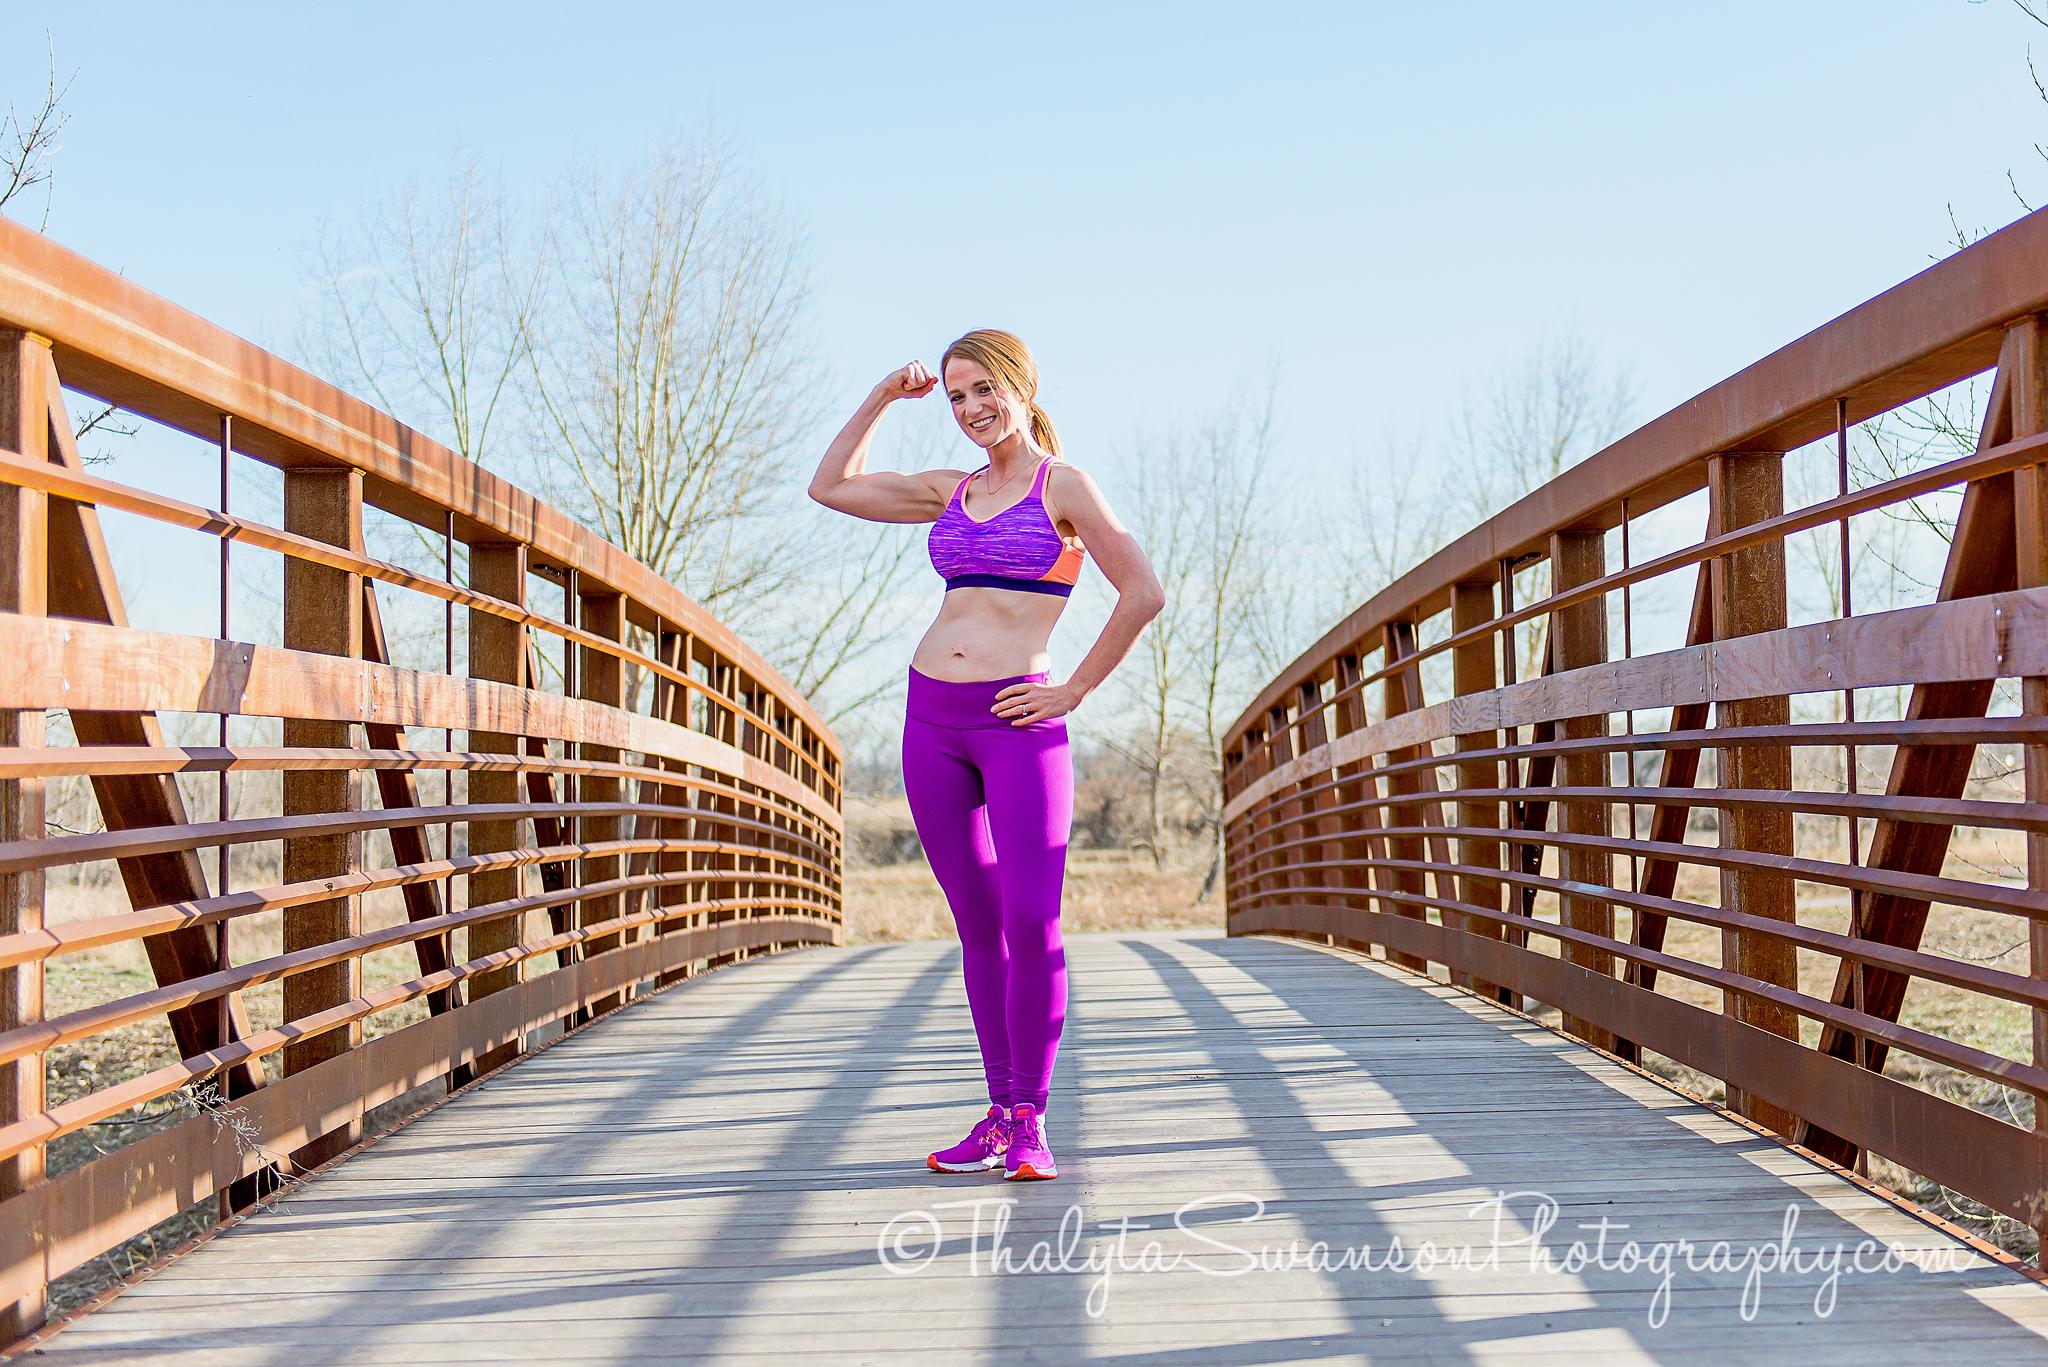 Thalyta Swanson Photography - Fitness Photos (12)